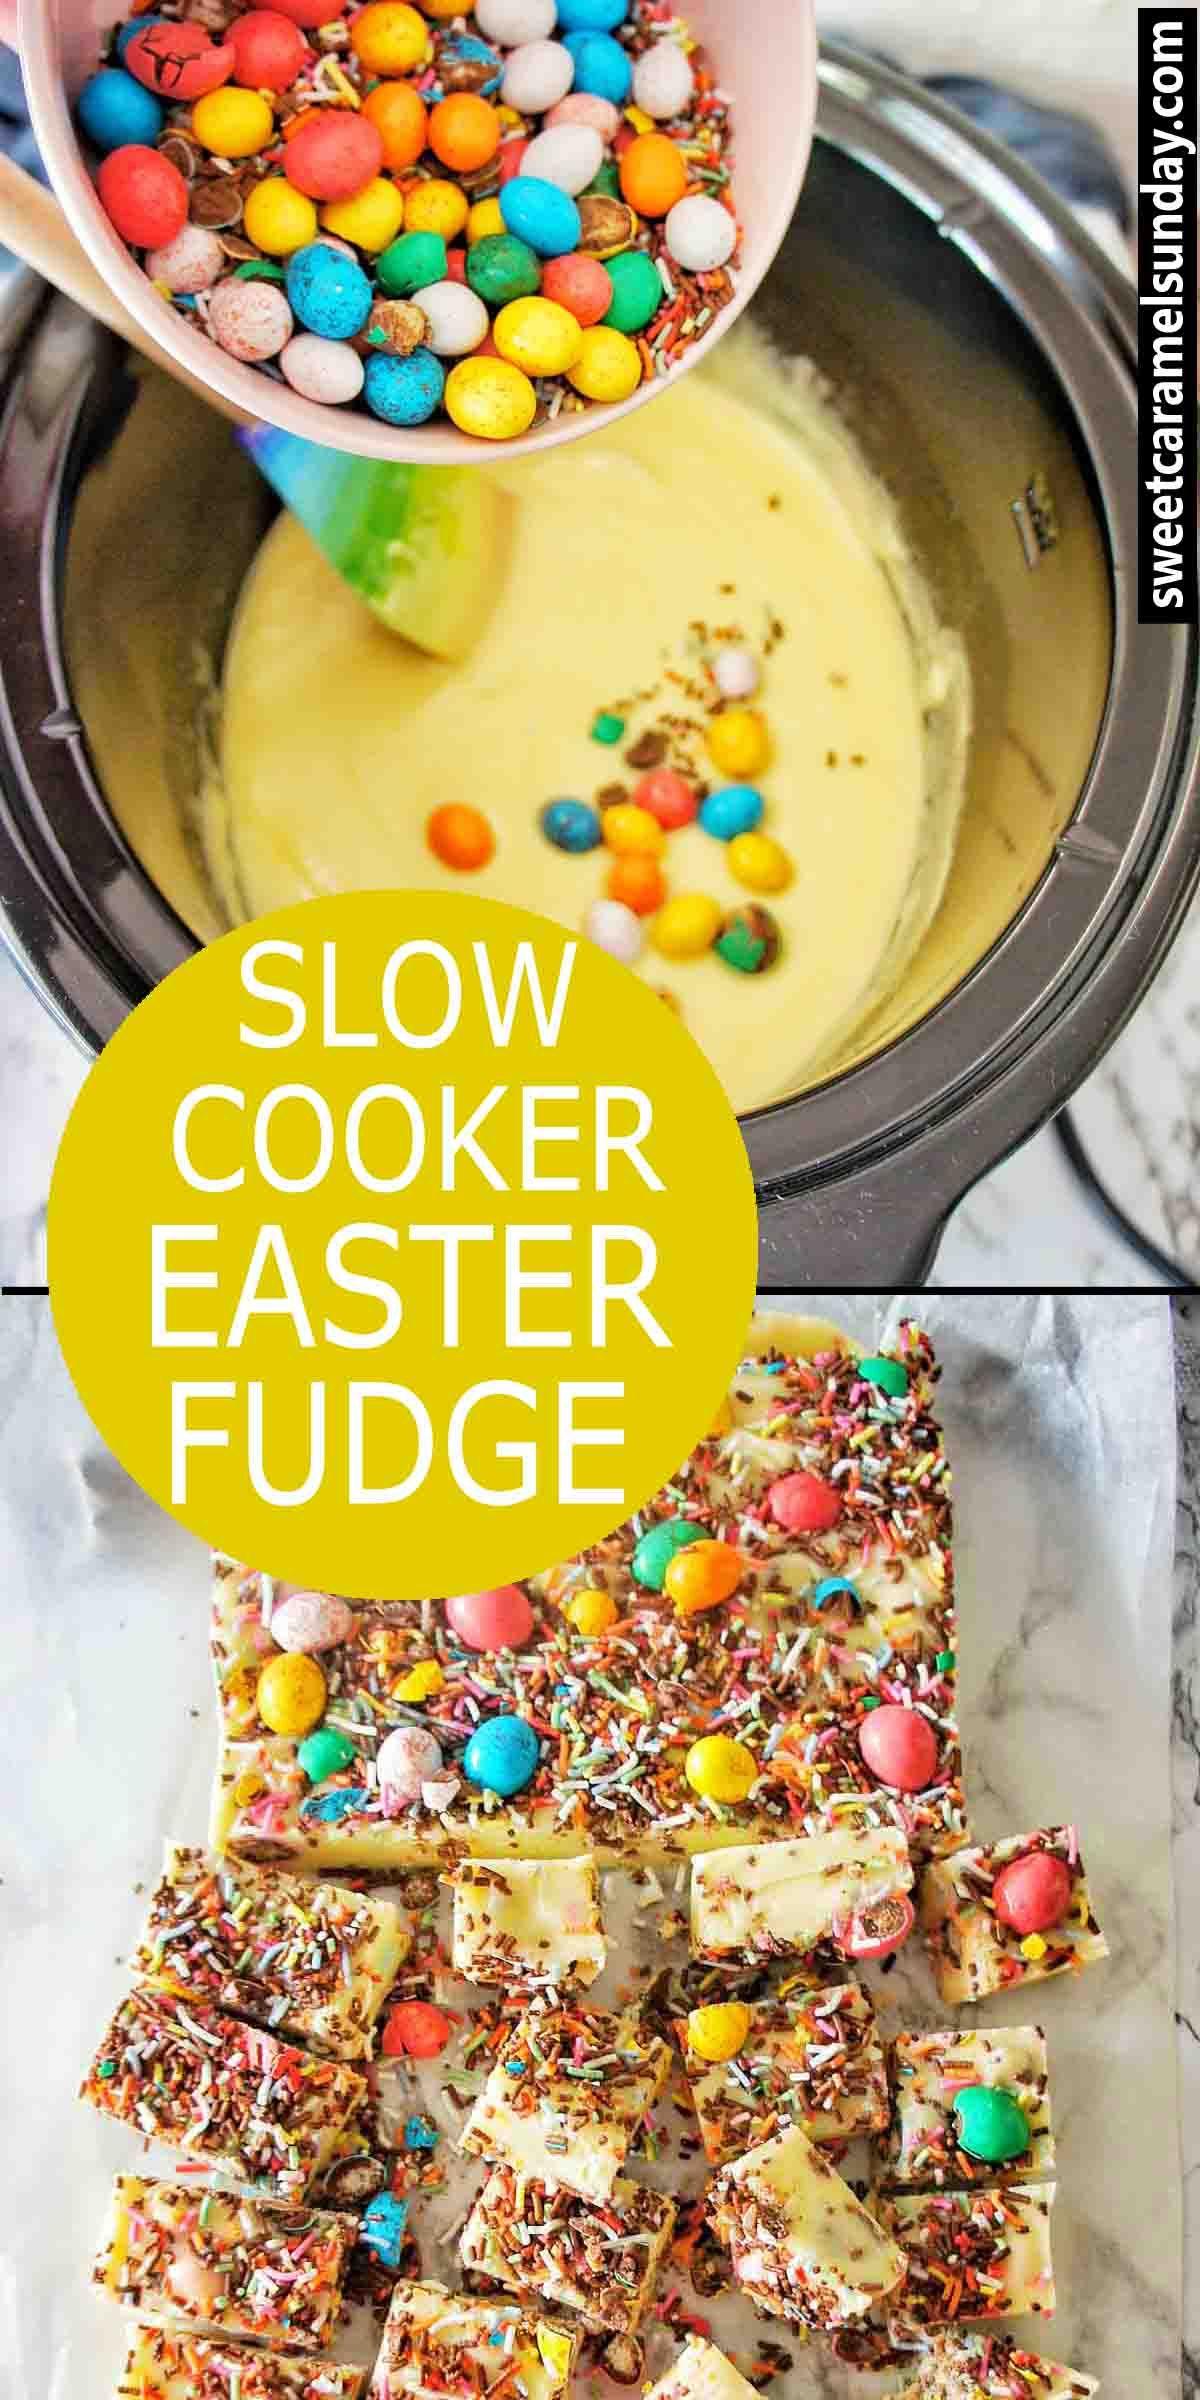 Easter fudge is a white chocolate fudge recipe using